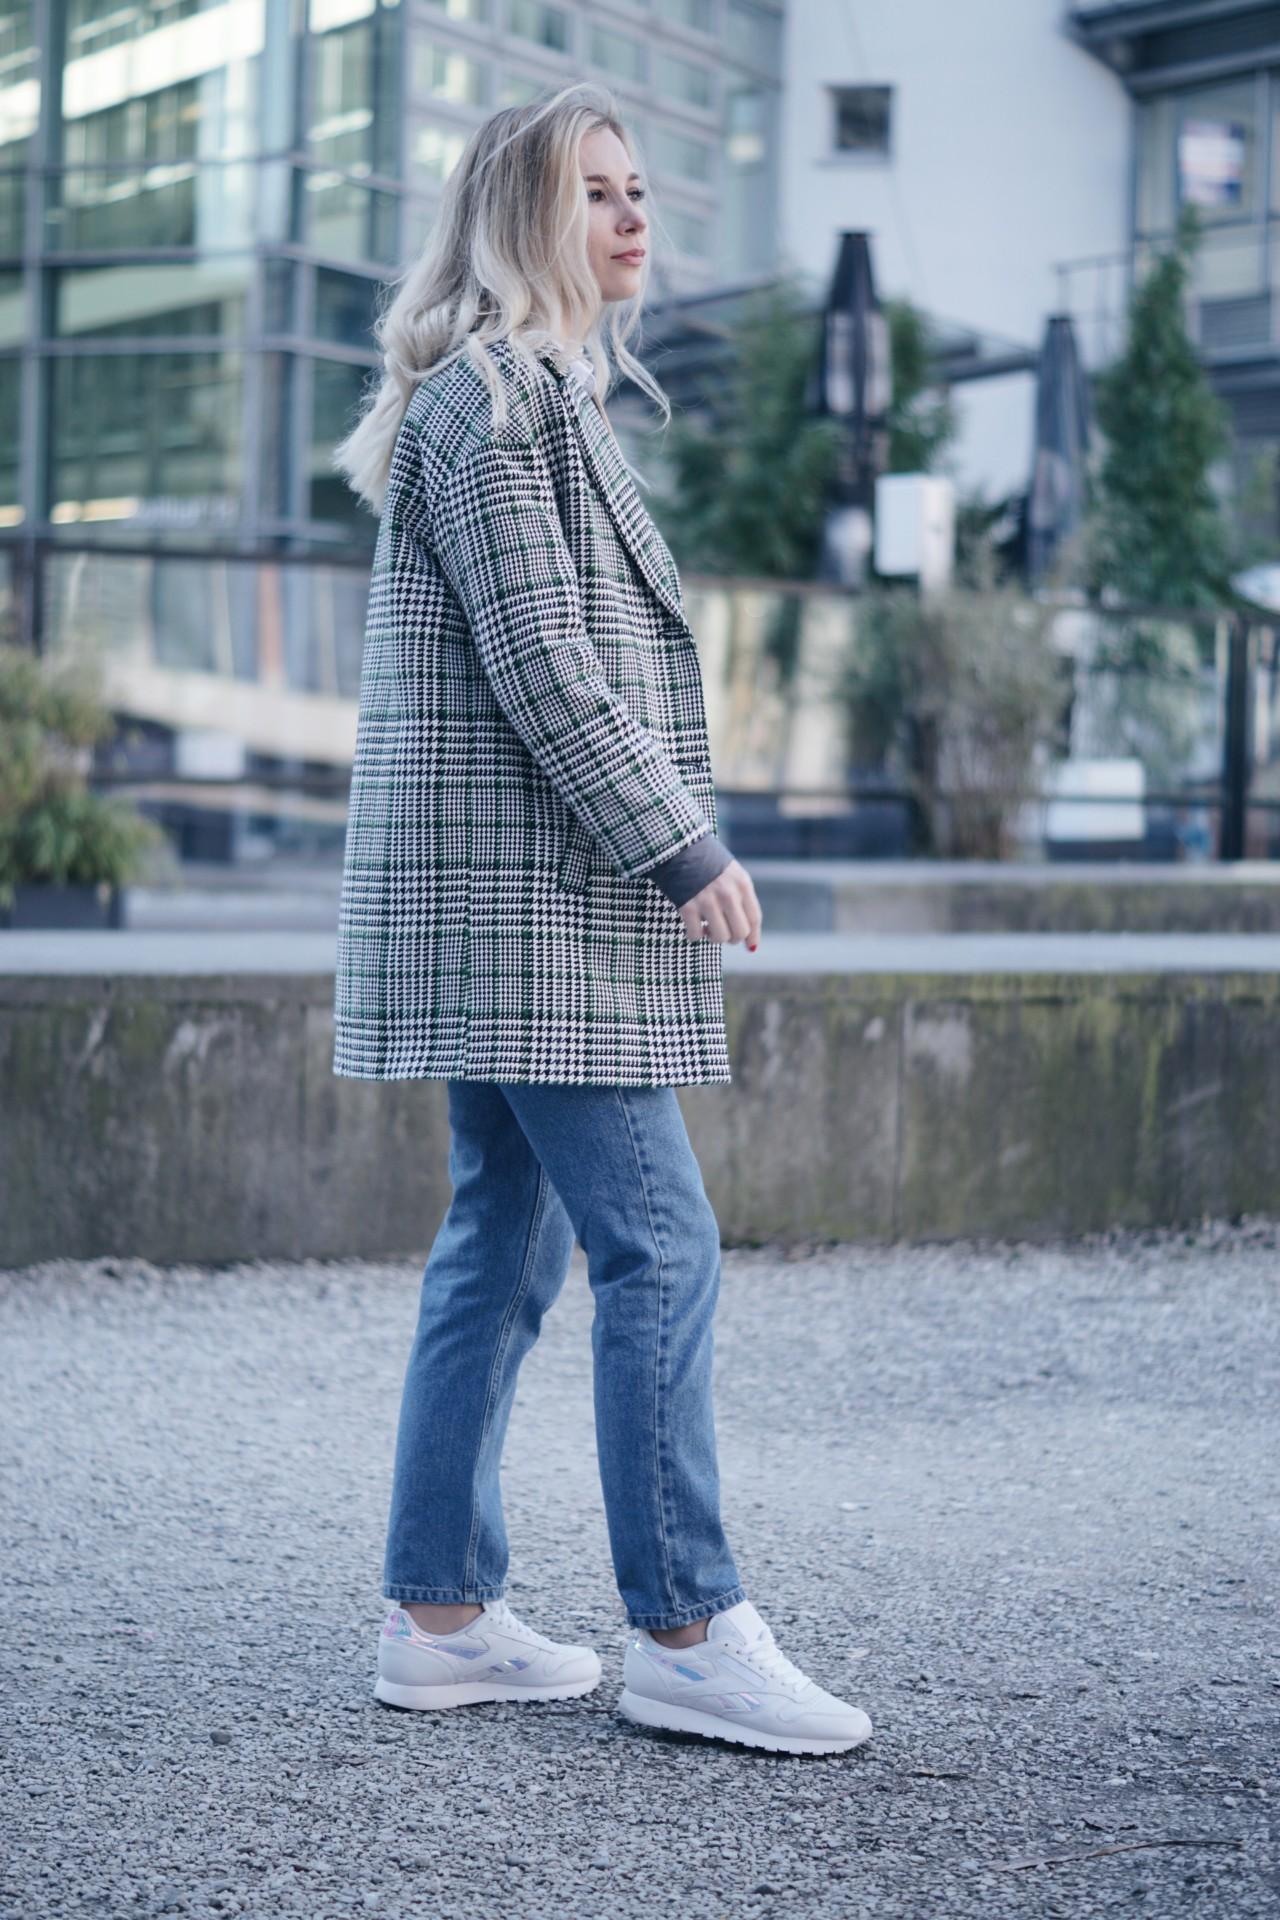 stradivarius_dbkstylez_spring_fashion_stretstyle